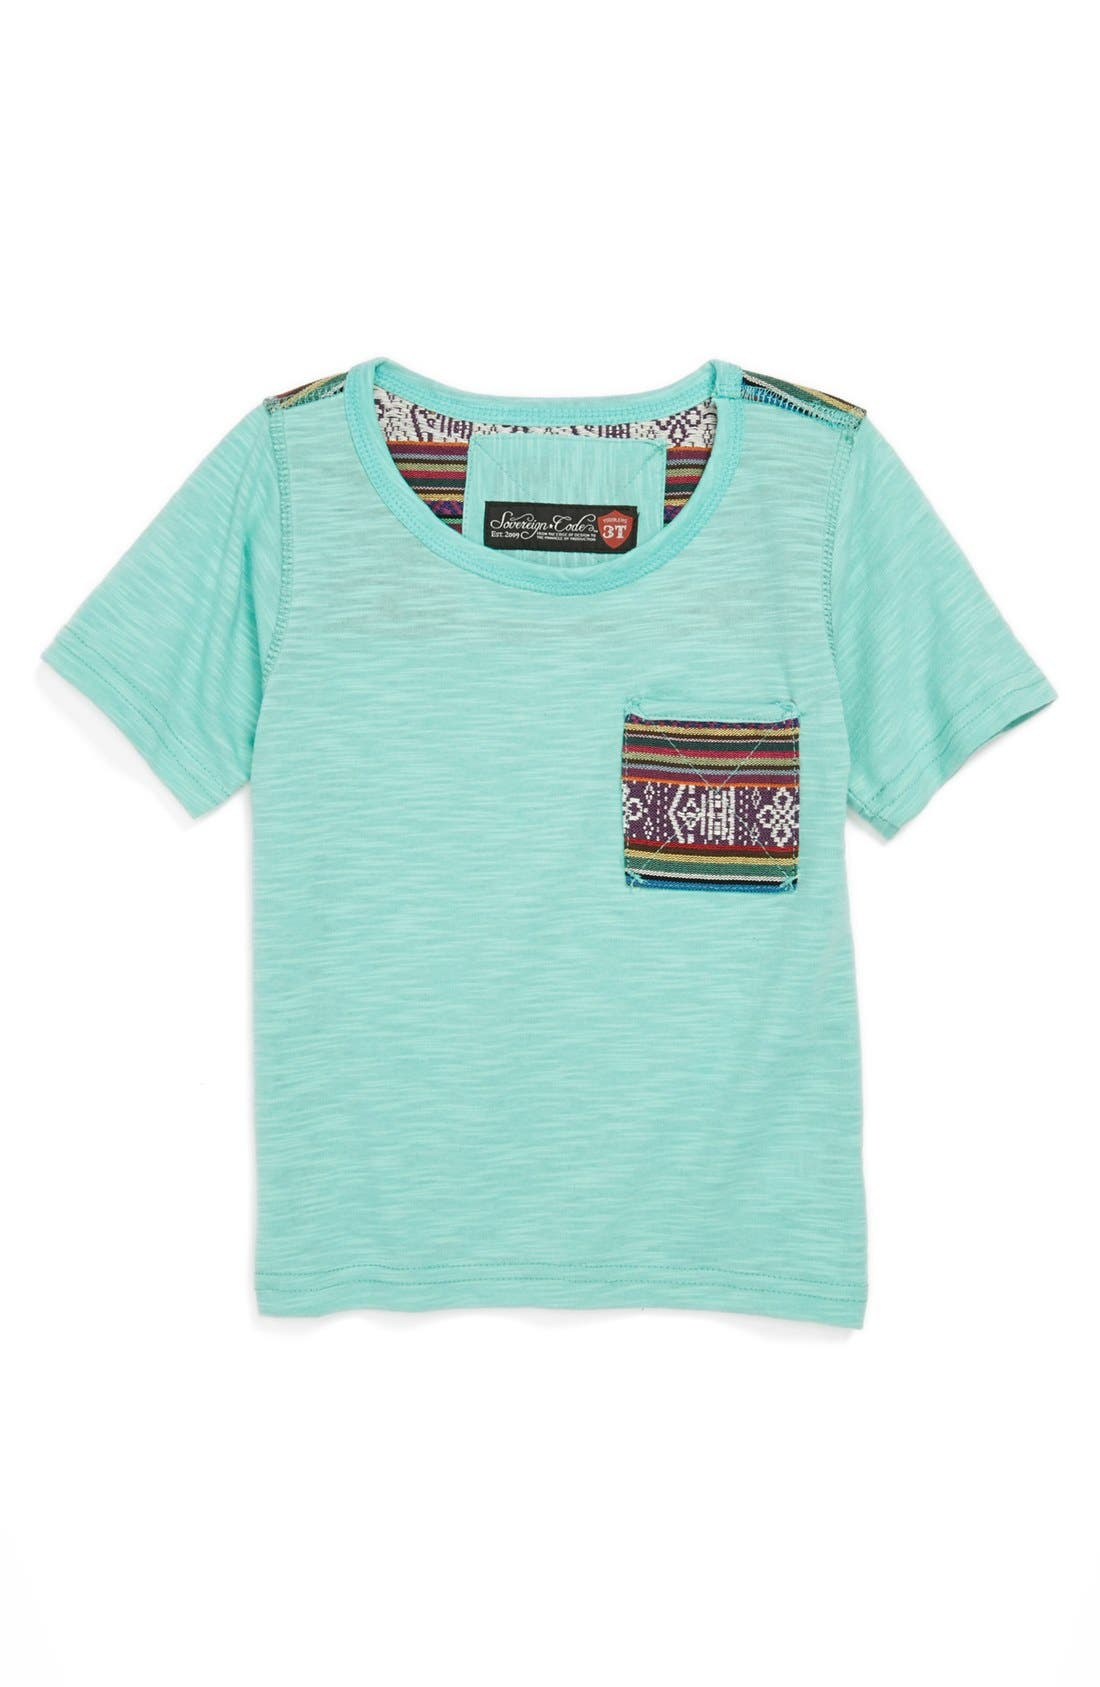 Alternate Image 1 Selected - Sovereign Code Contrast Pocket T-Shirt (Toddler Boys)